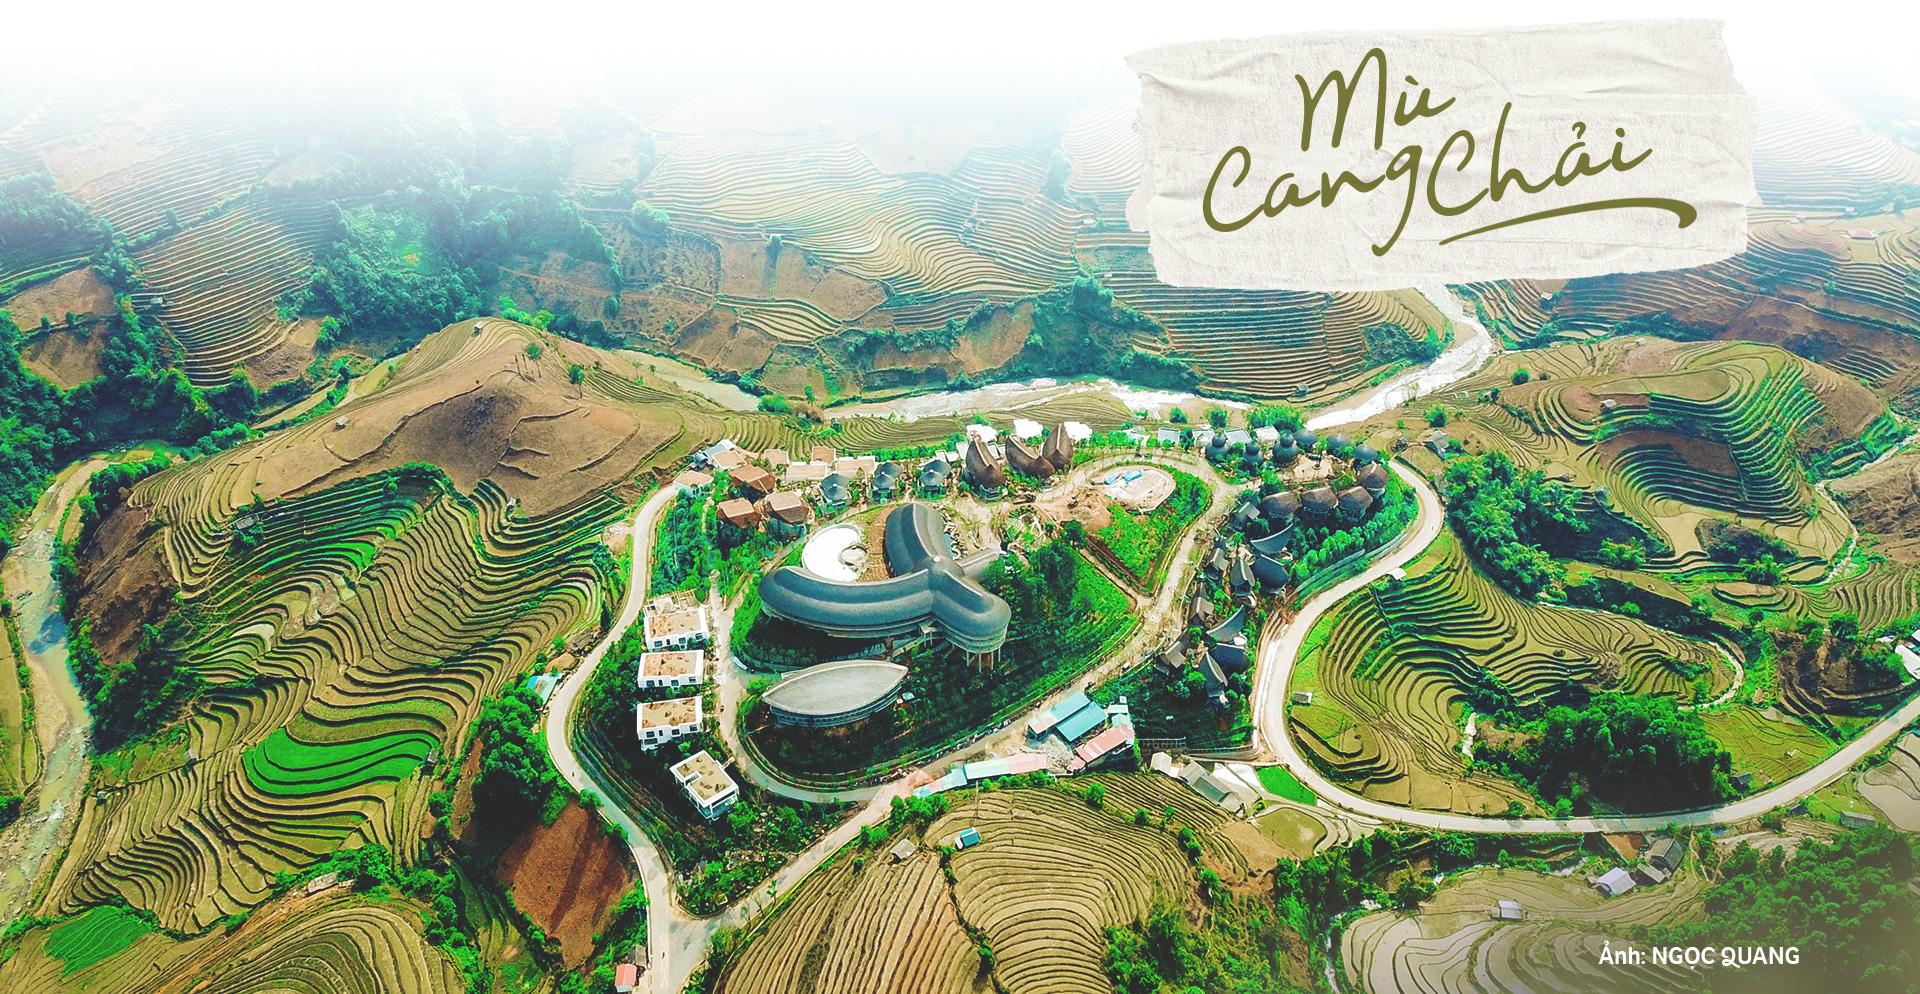 Upcoming tourism hub in northwest Vietnam says no to gentrification